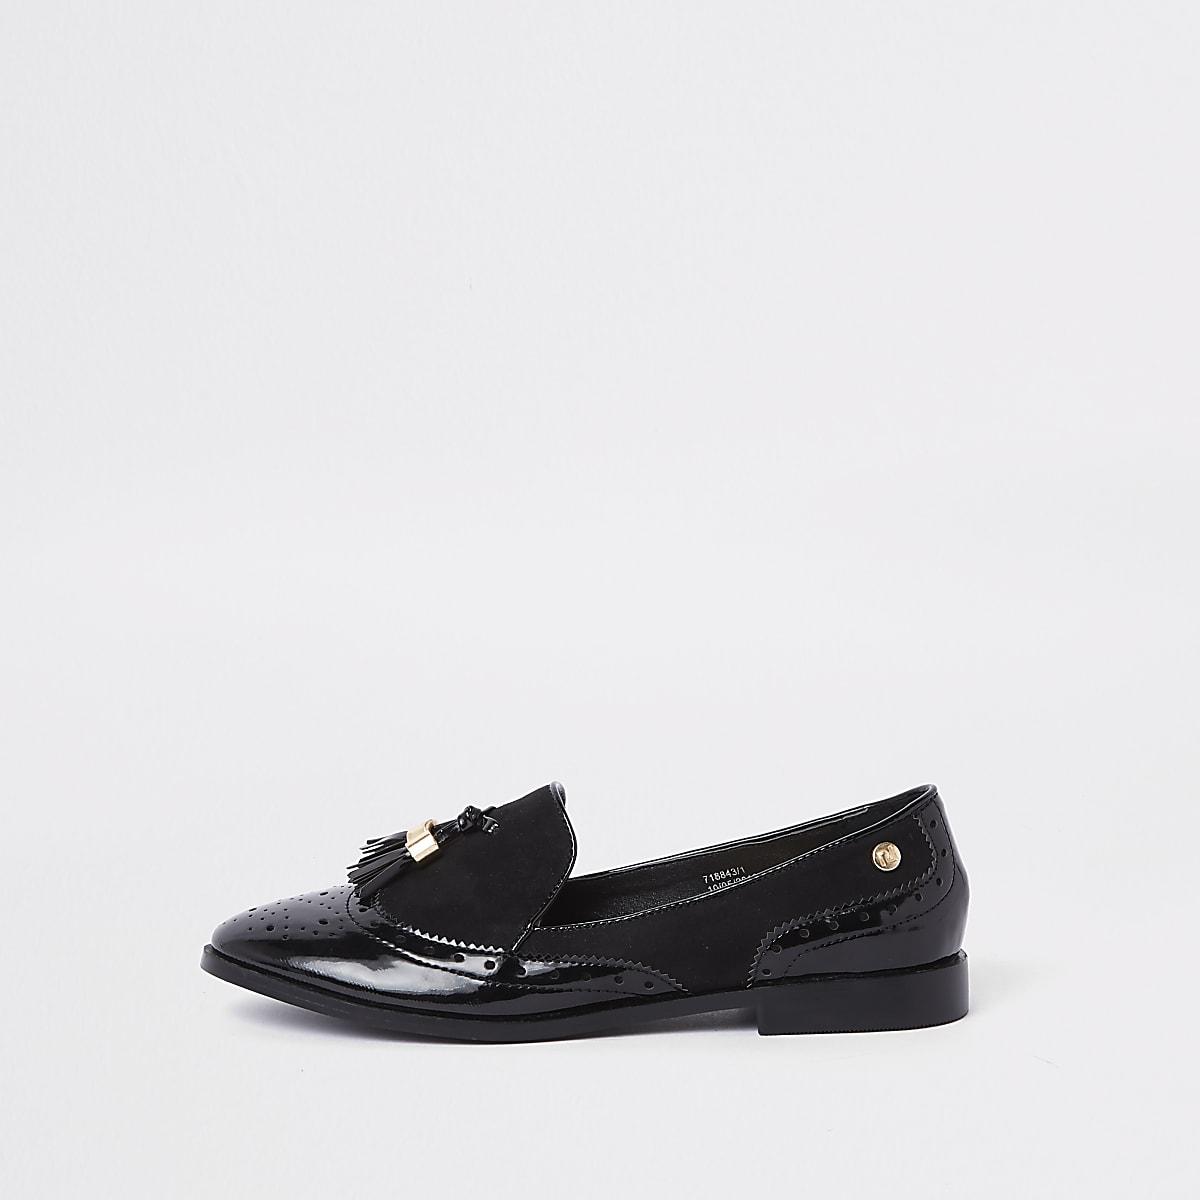 Black tassel patent shoes